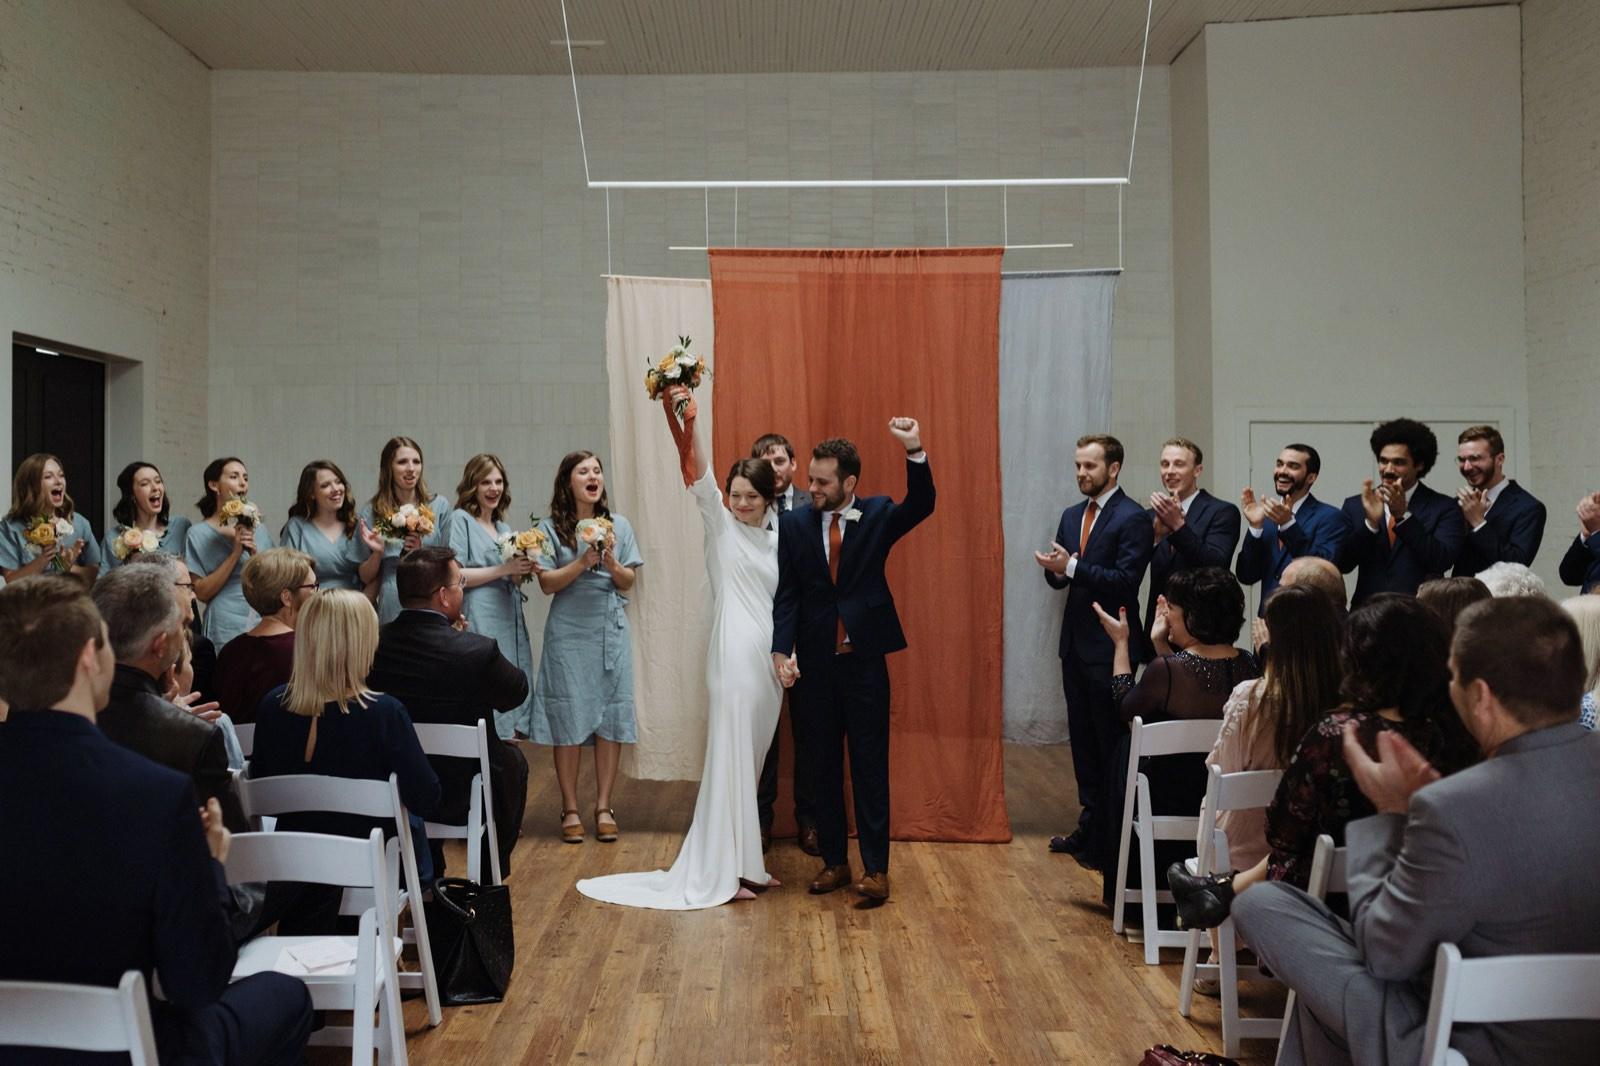 Draped earthy-toned fabric ceremony backdrop for an urban loft wedding near Austin